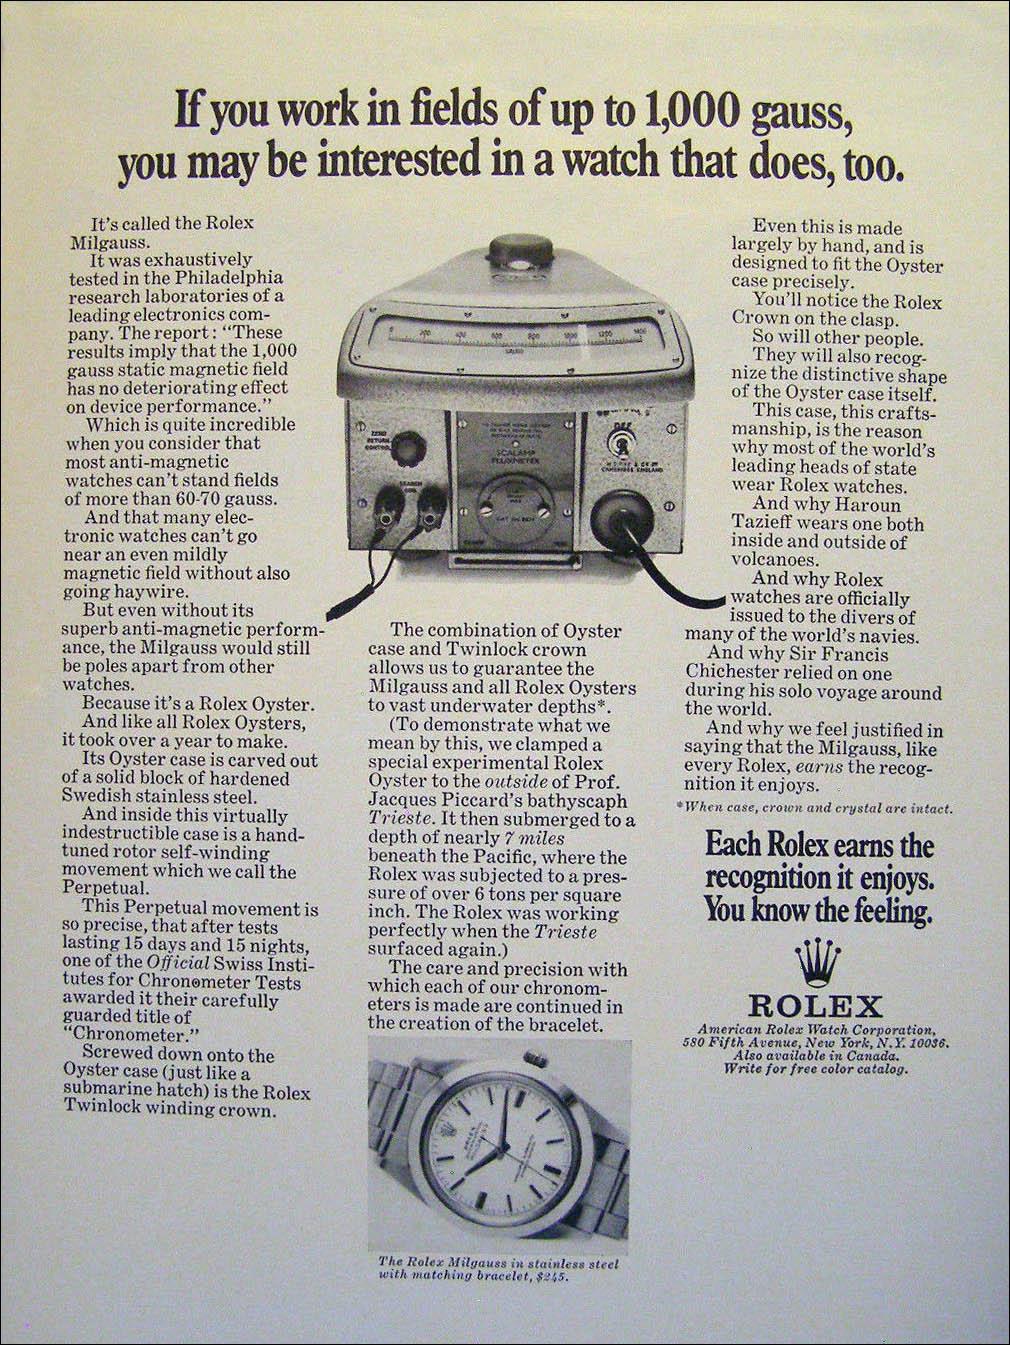 Rolex-milgauss-1019-advertising